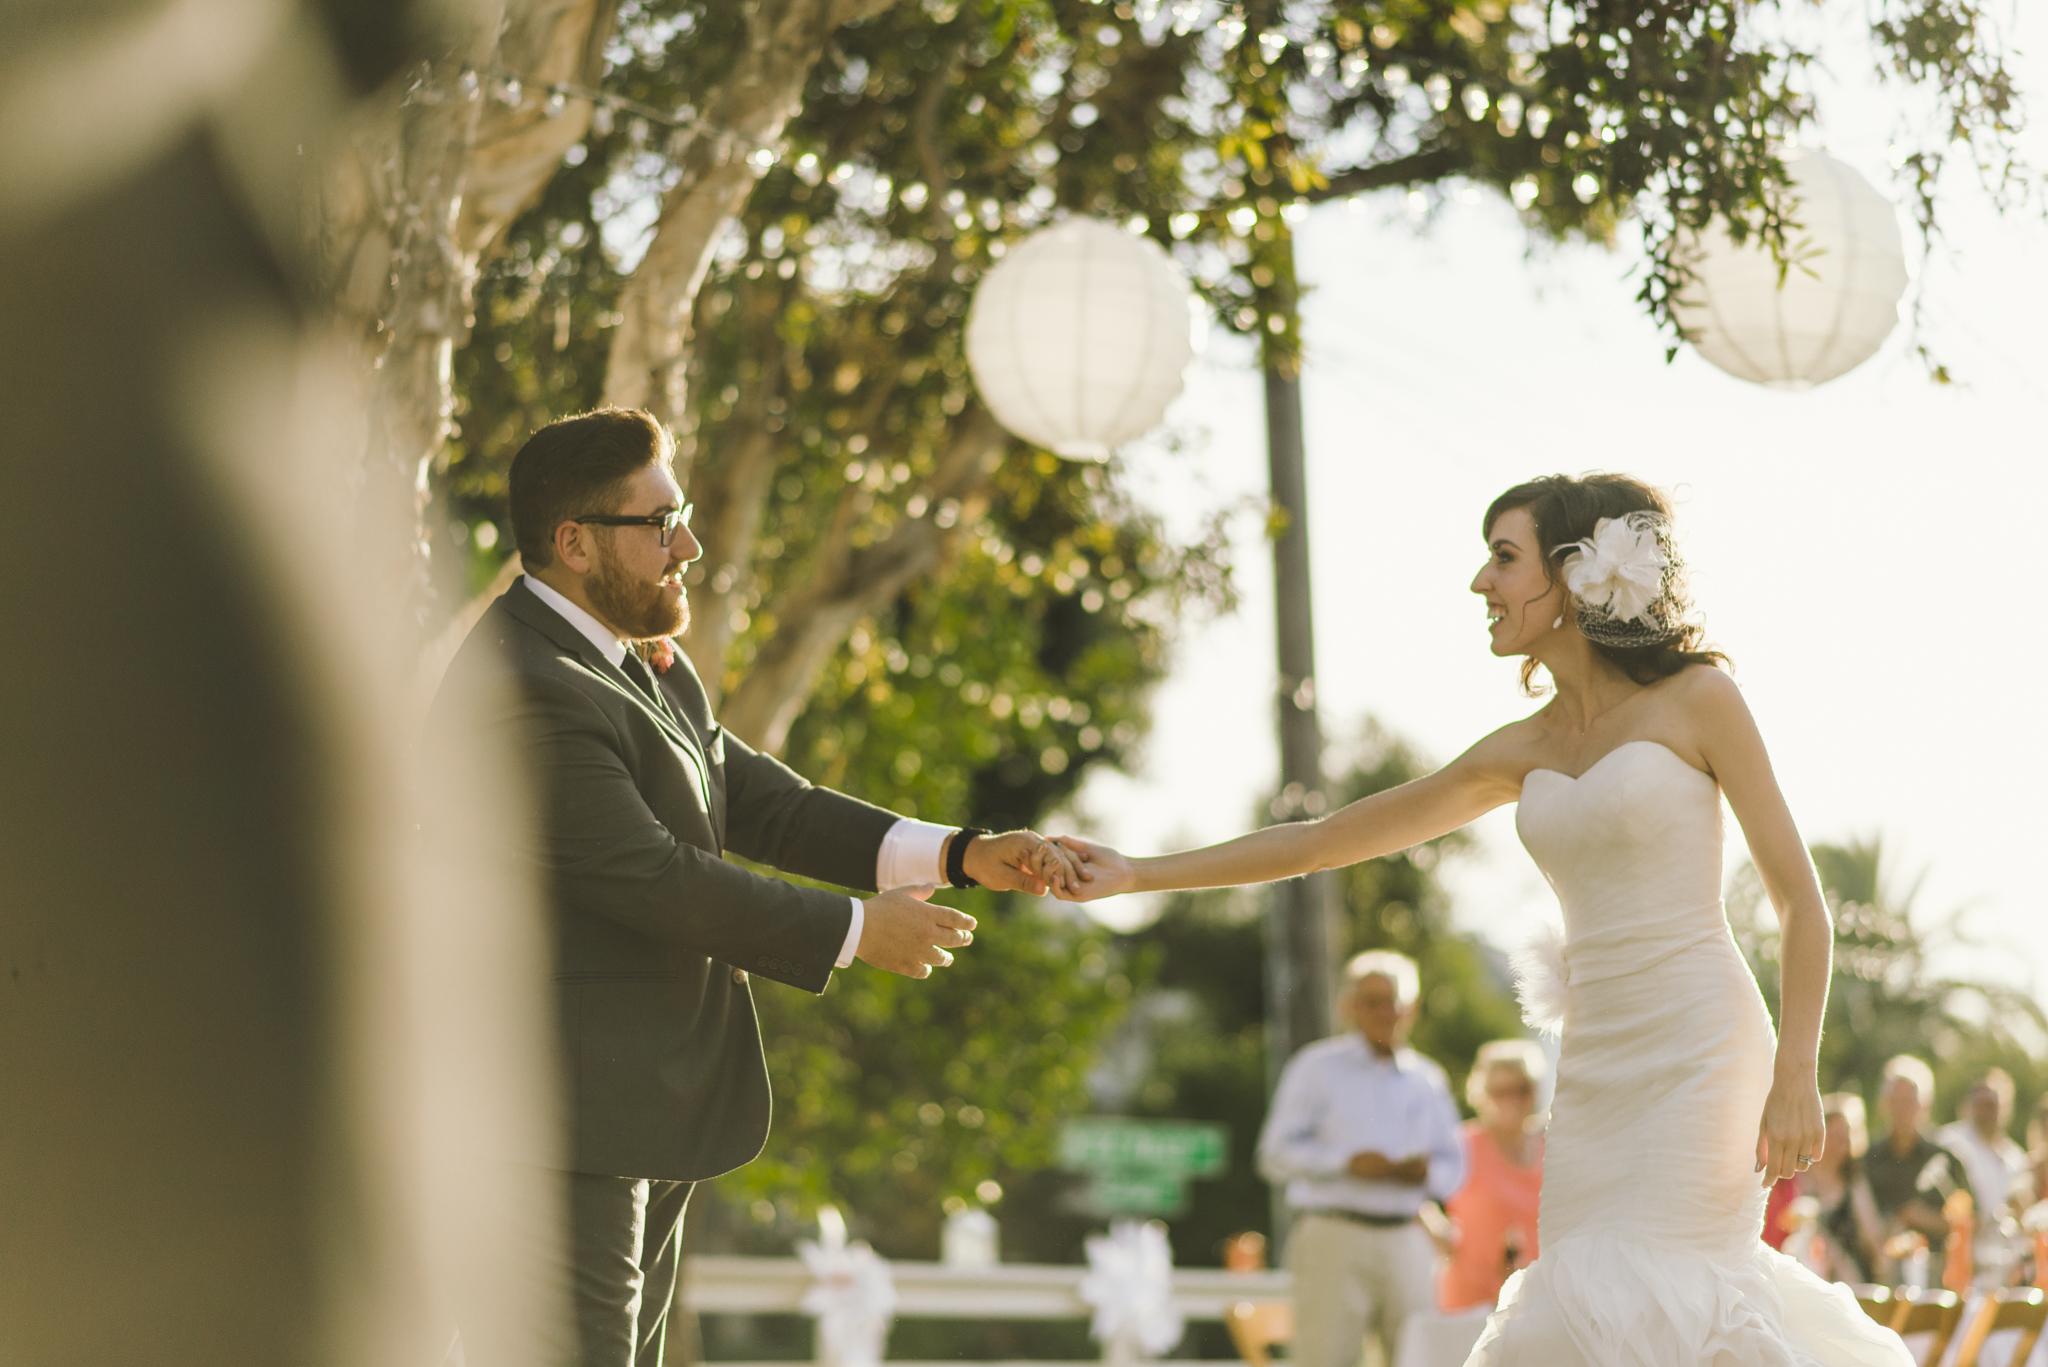 Isaiah & Taylor Photography - Los Angeles Lifestyle Wedding Photographer-47.jpg